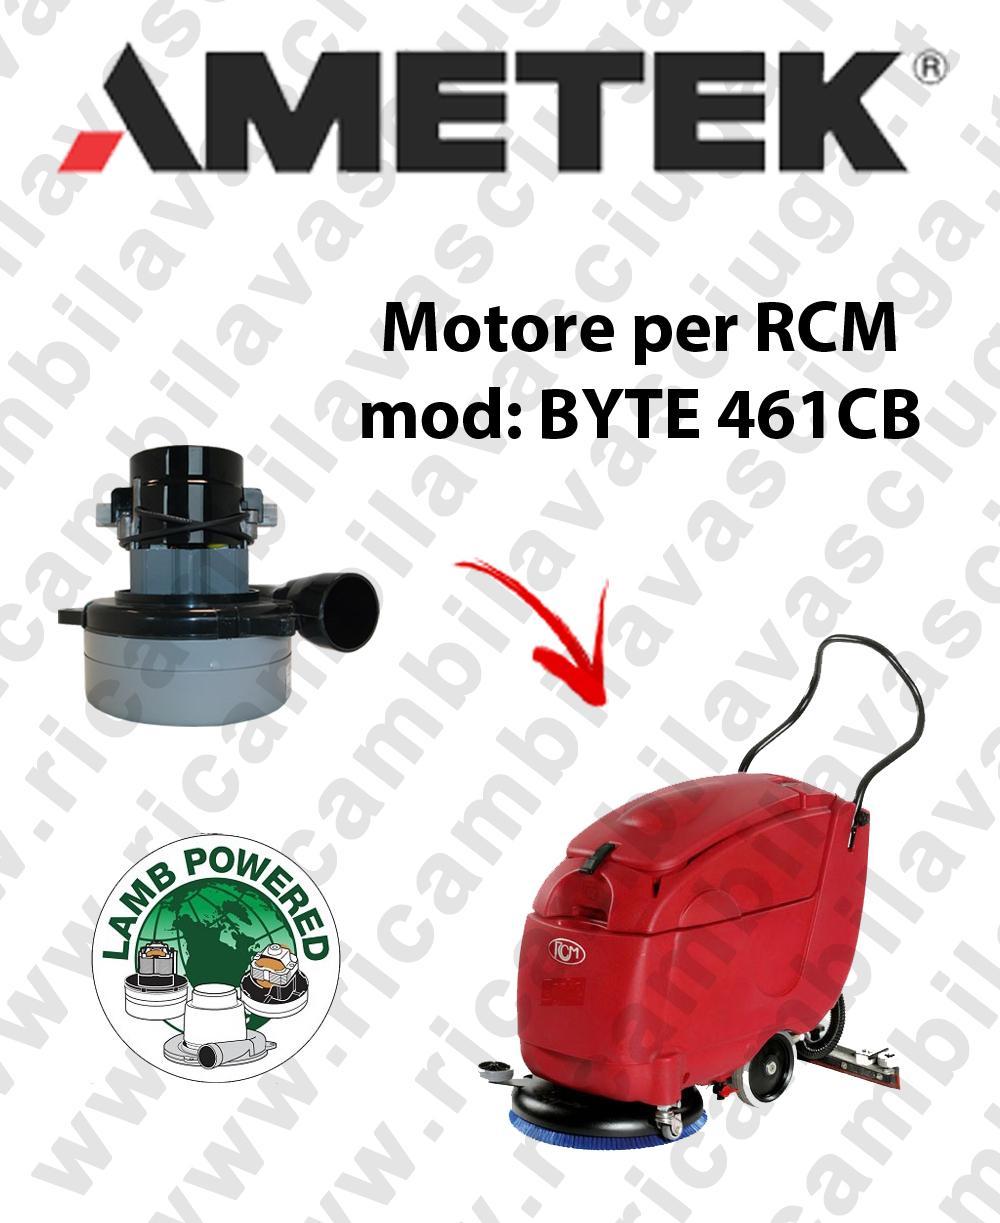 BYTE 461 CB MOTORE LAMB AMETEK aspirazione fregadora RCM